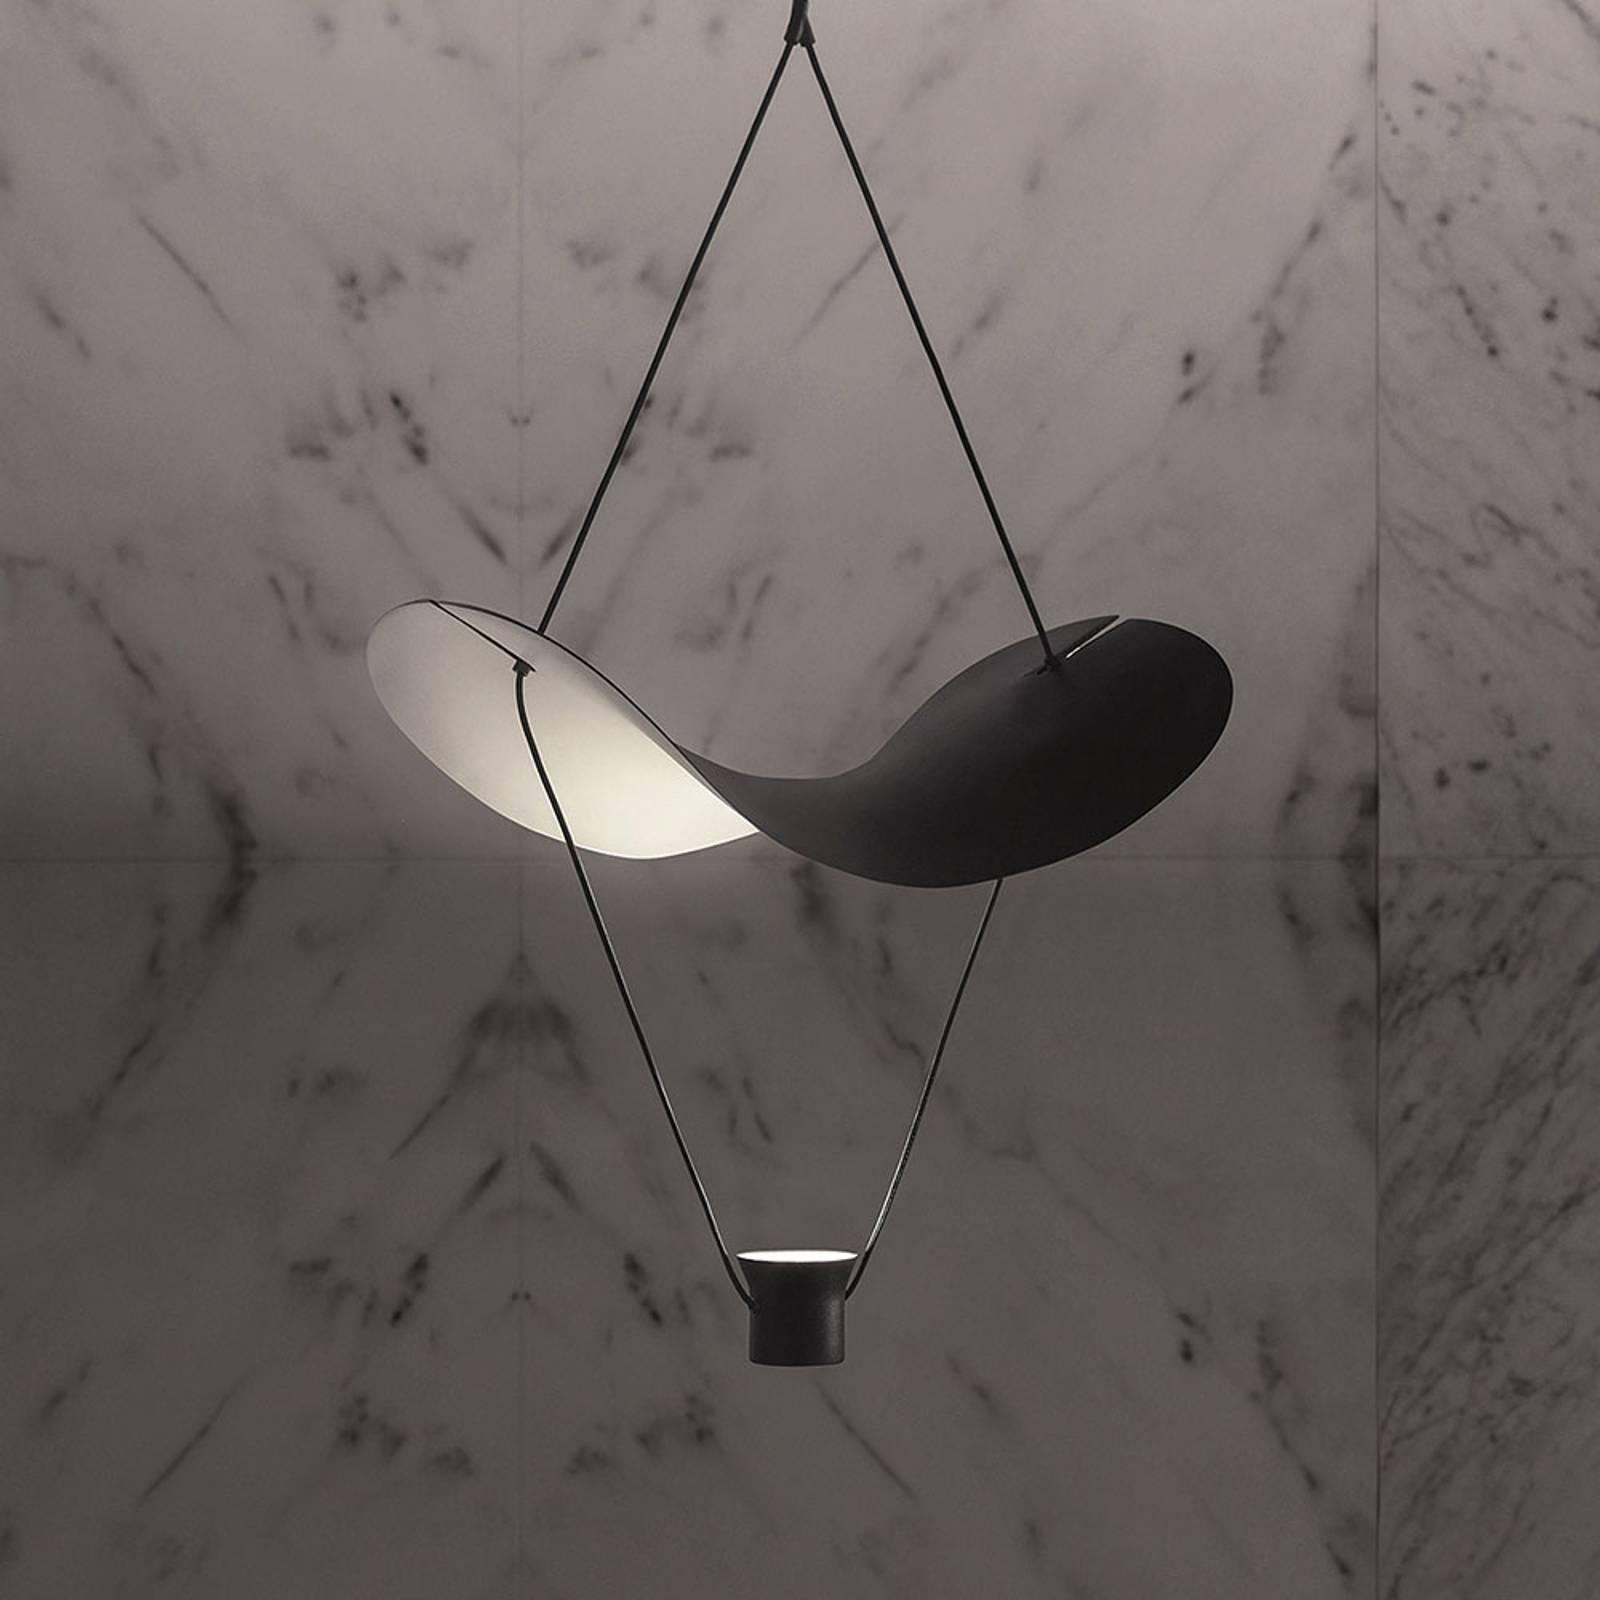 LED-riippuvalaisin Vollee S1 G, 88 cm, musta